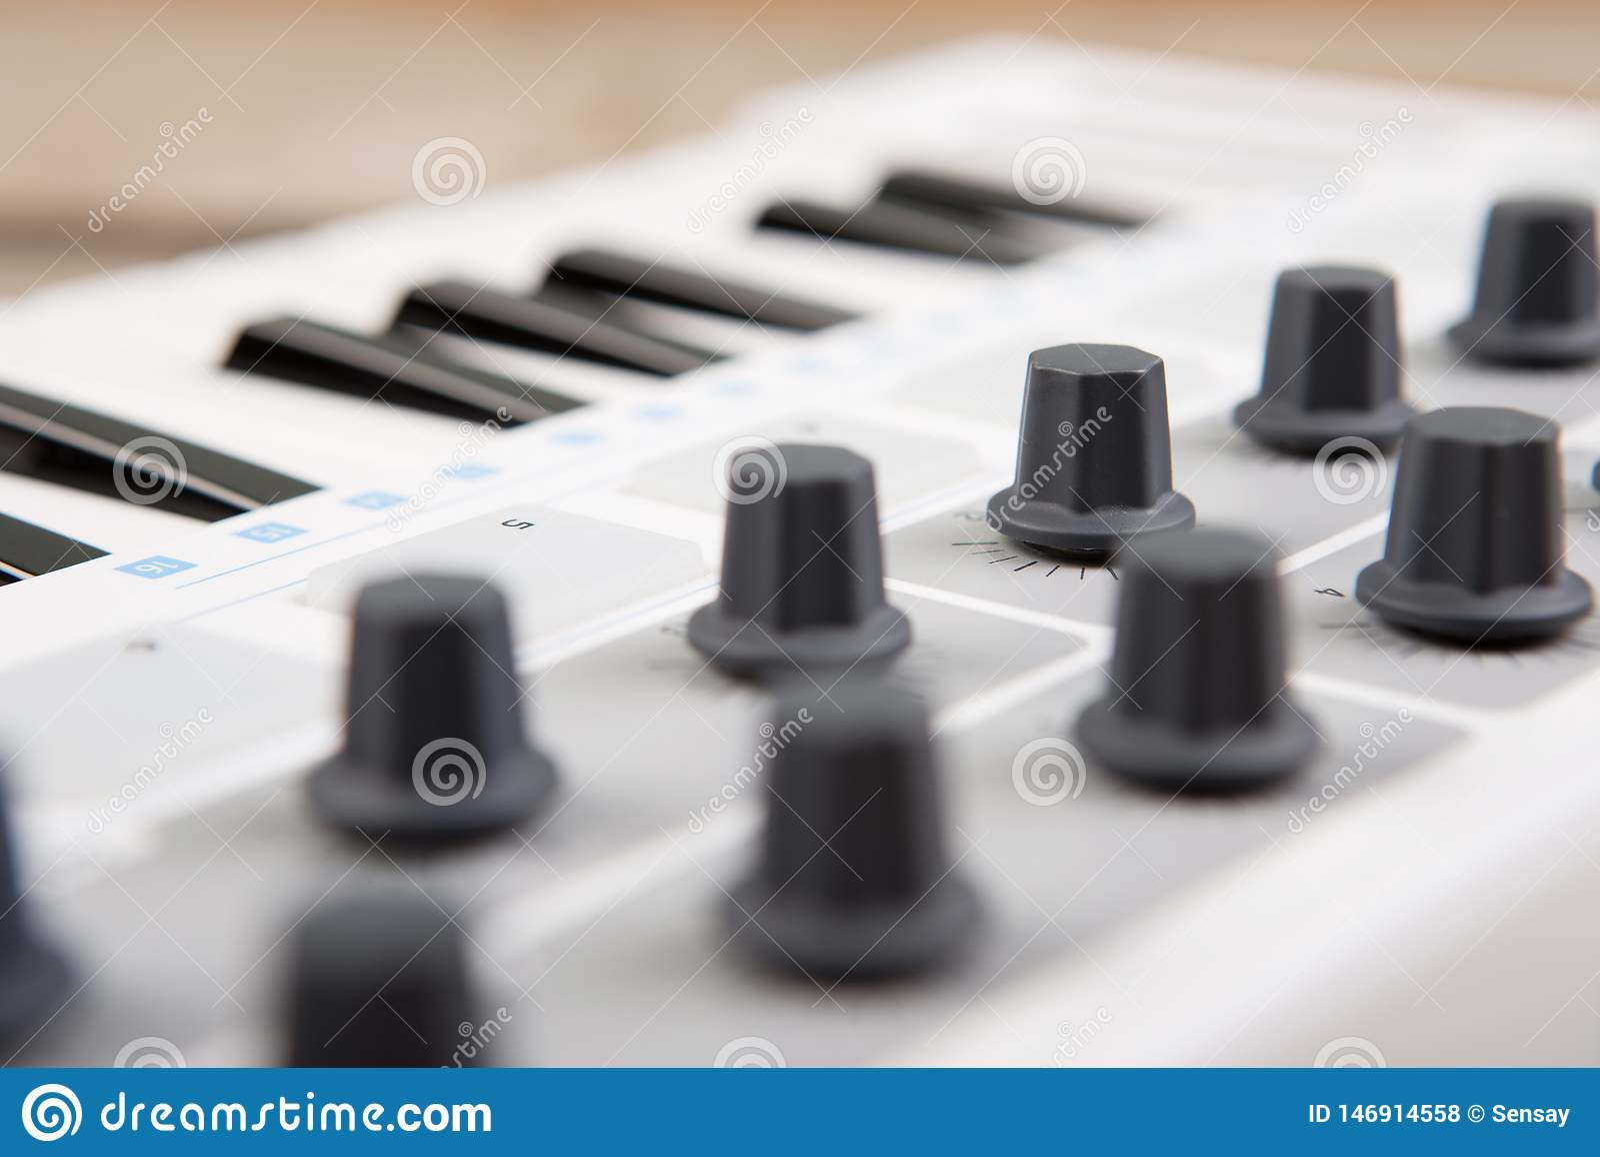 Close up of MIDI controller volume fader, knob and keys